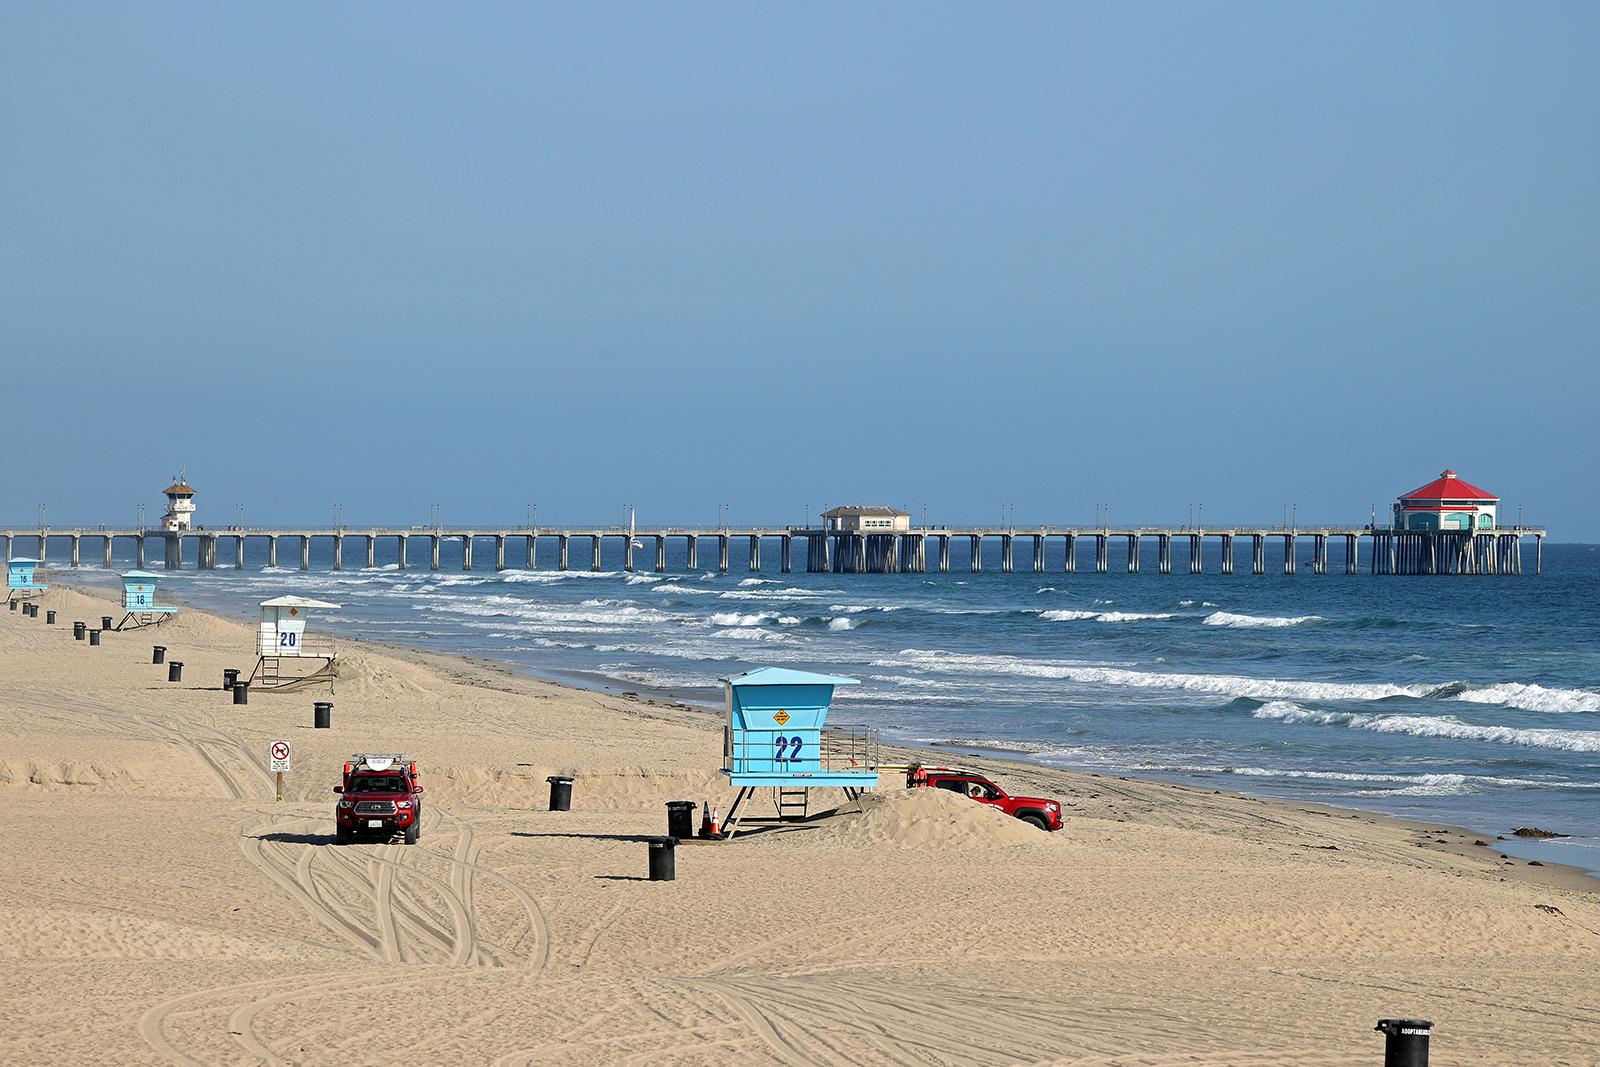 Lifeguards patrol an empty beach in front of the Huntington Beach Pier on Sunday, May 3, in Huntington Beach, California.